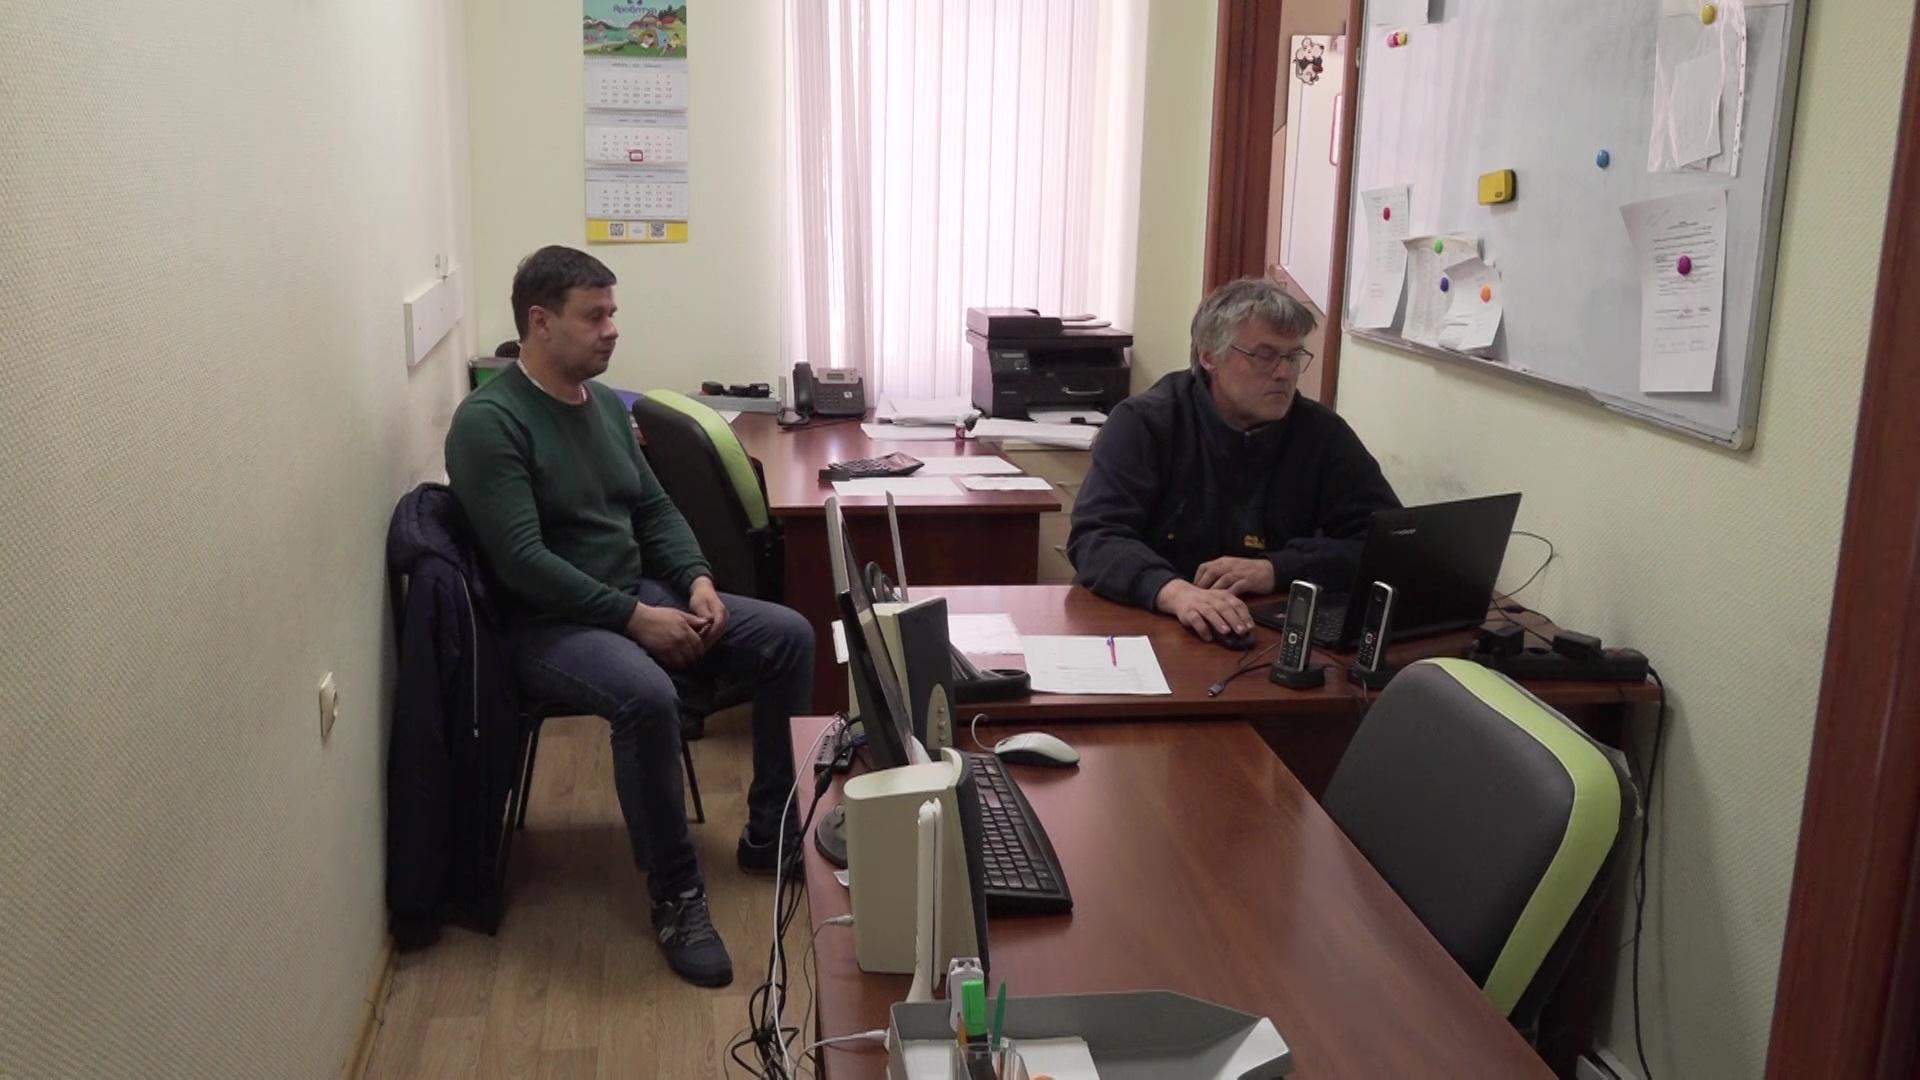 По инициативе Дмитрия Миронова в регионе принят пакет мер поддержки бизнеса